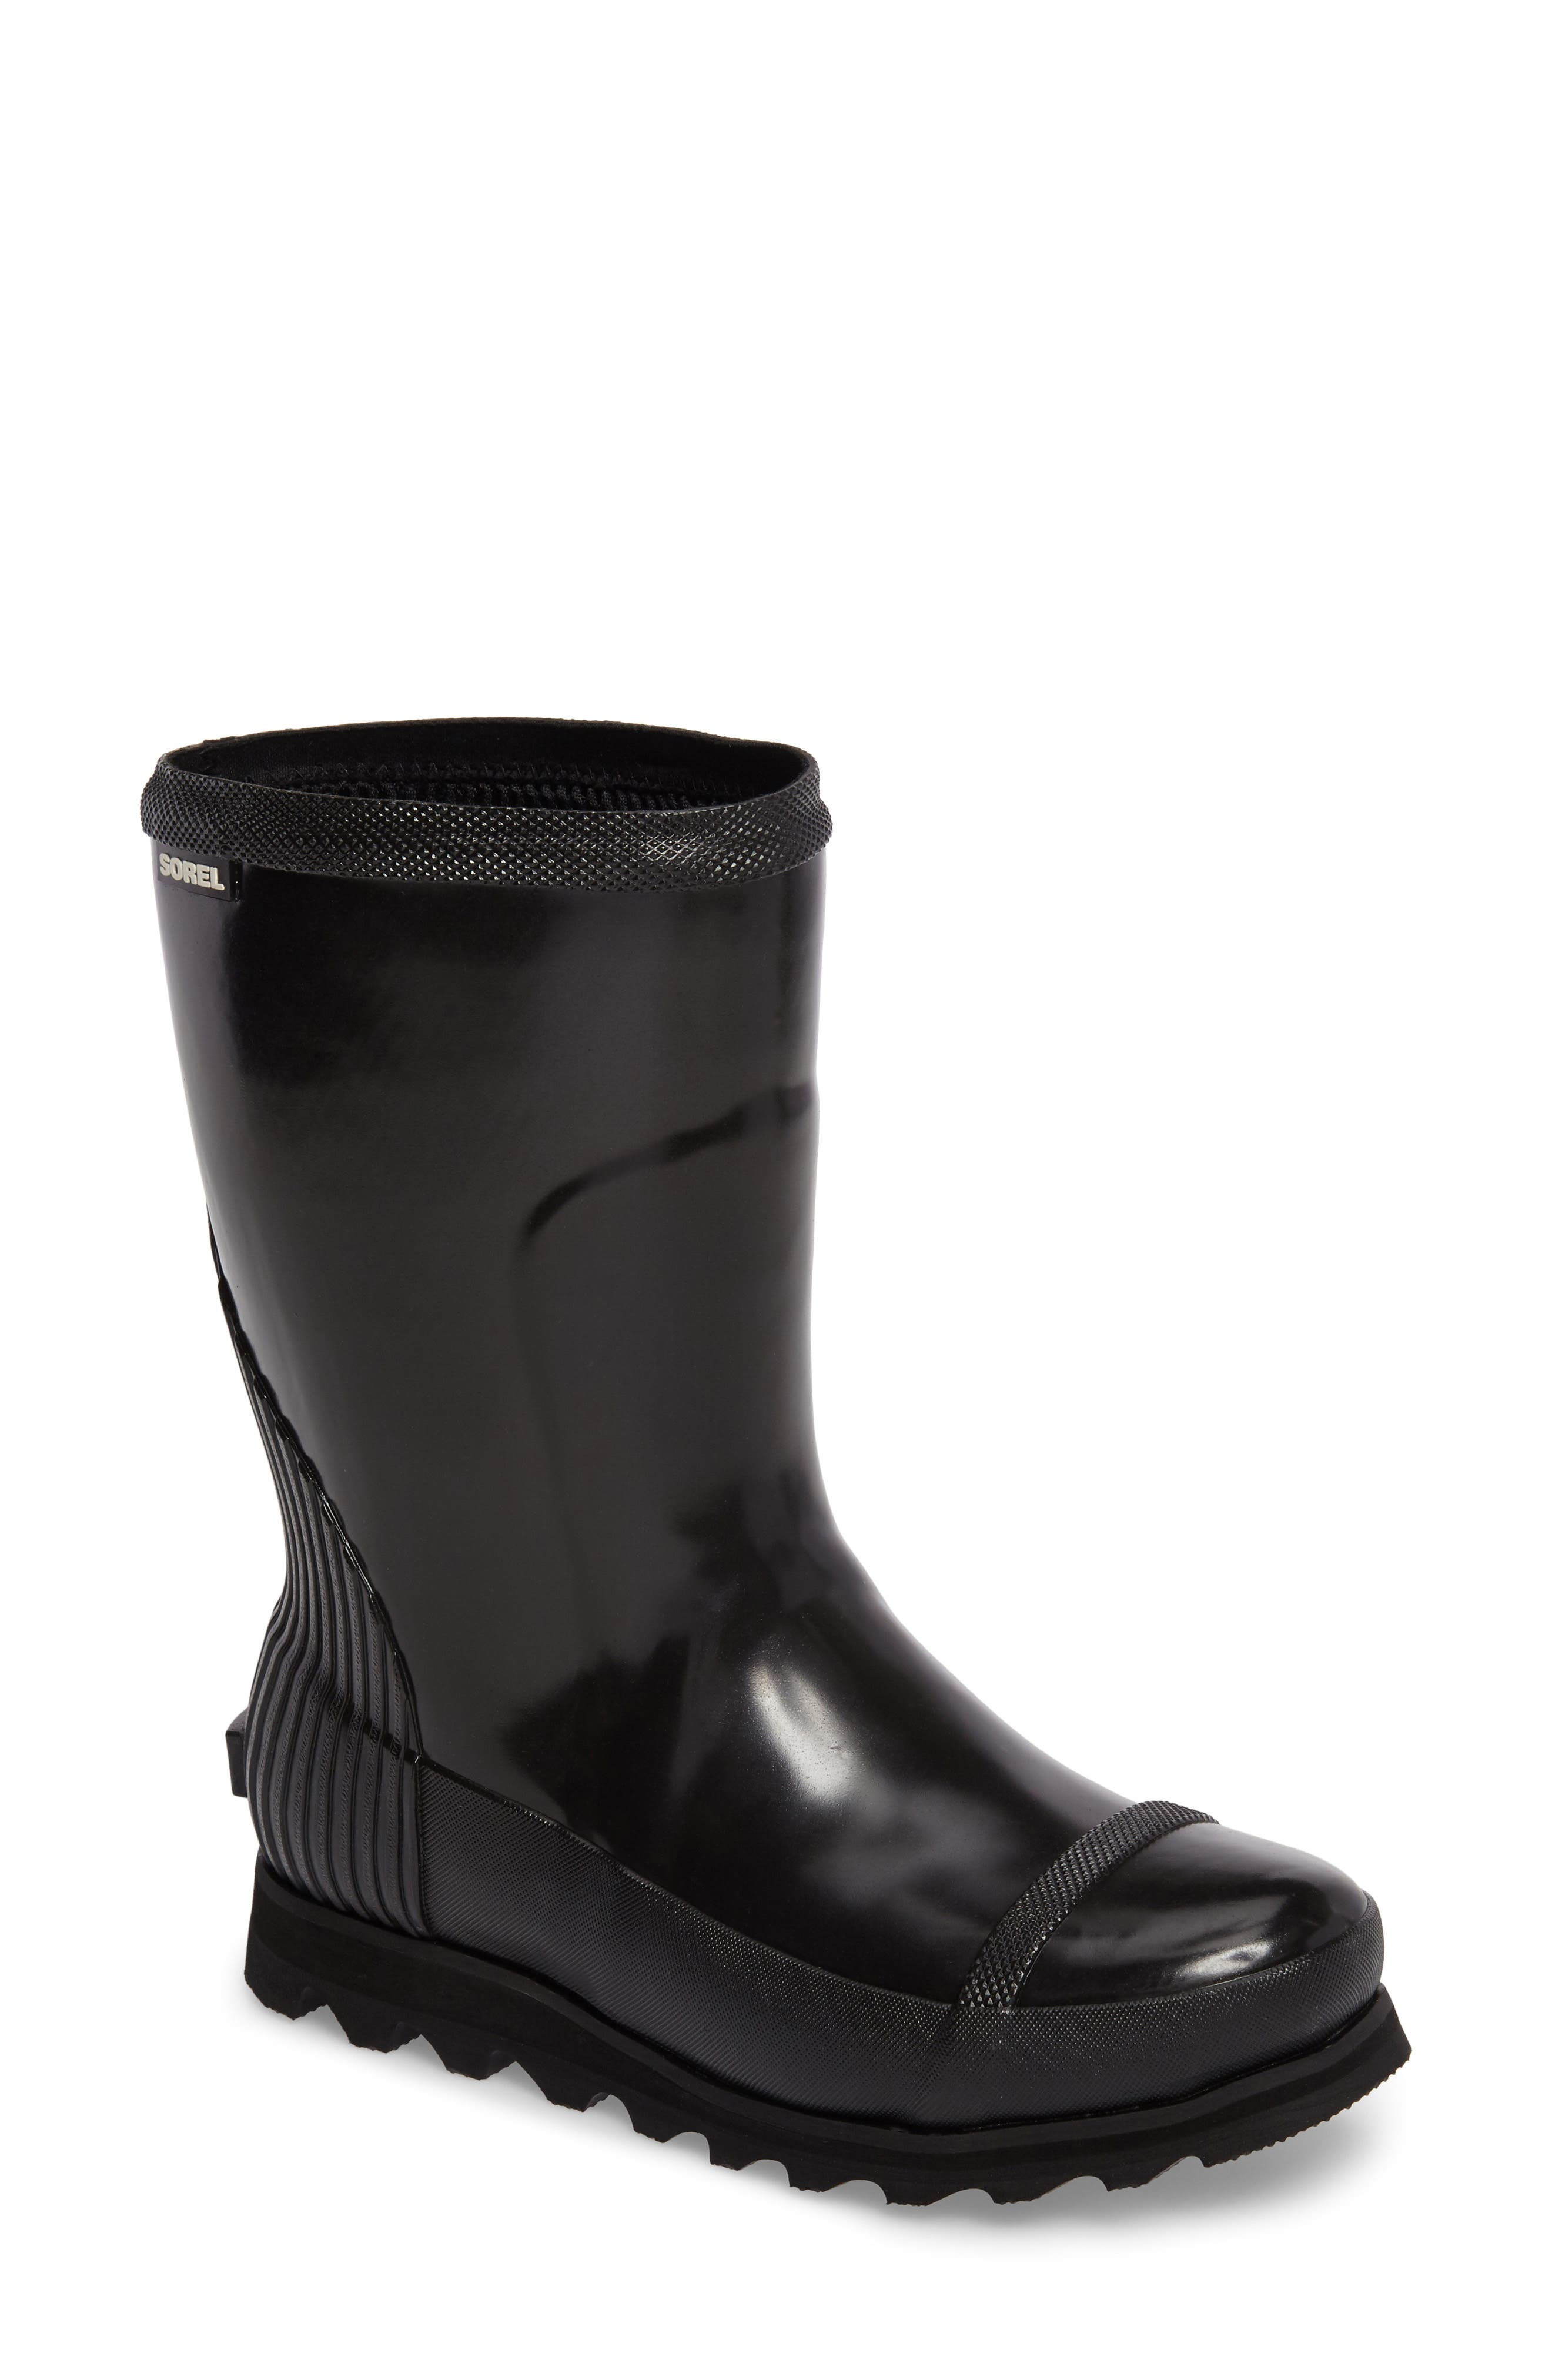 Joan Glossy Short Rain Boot,                         Main,                         color, Black/ Sea Salt